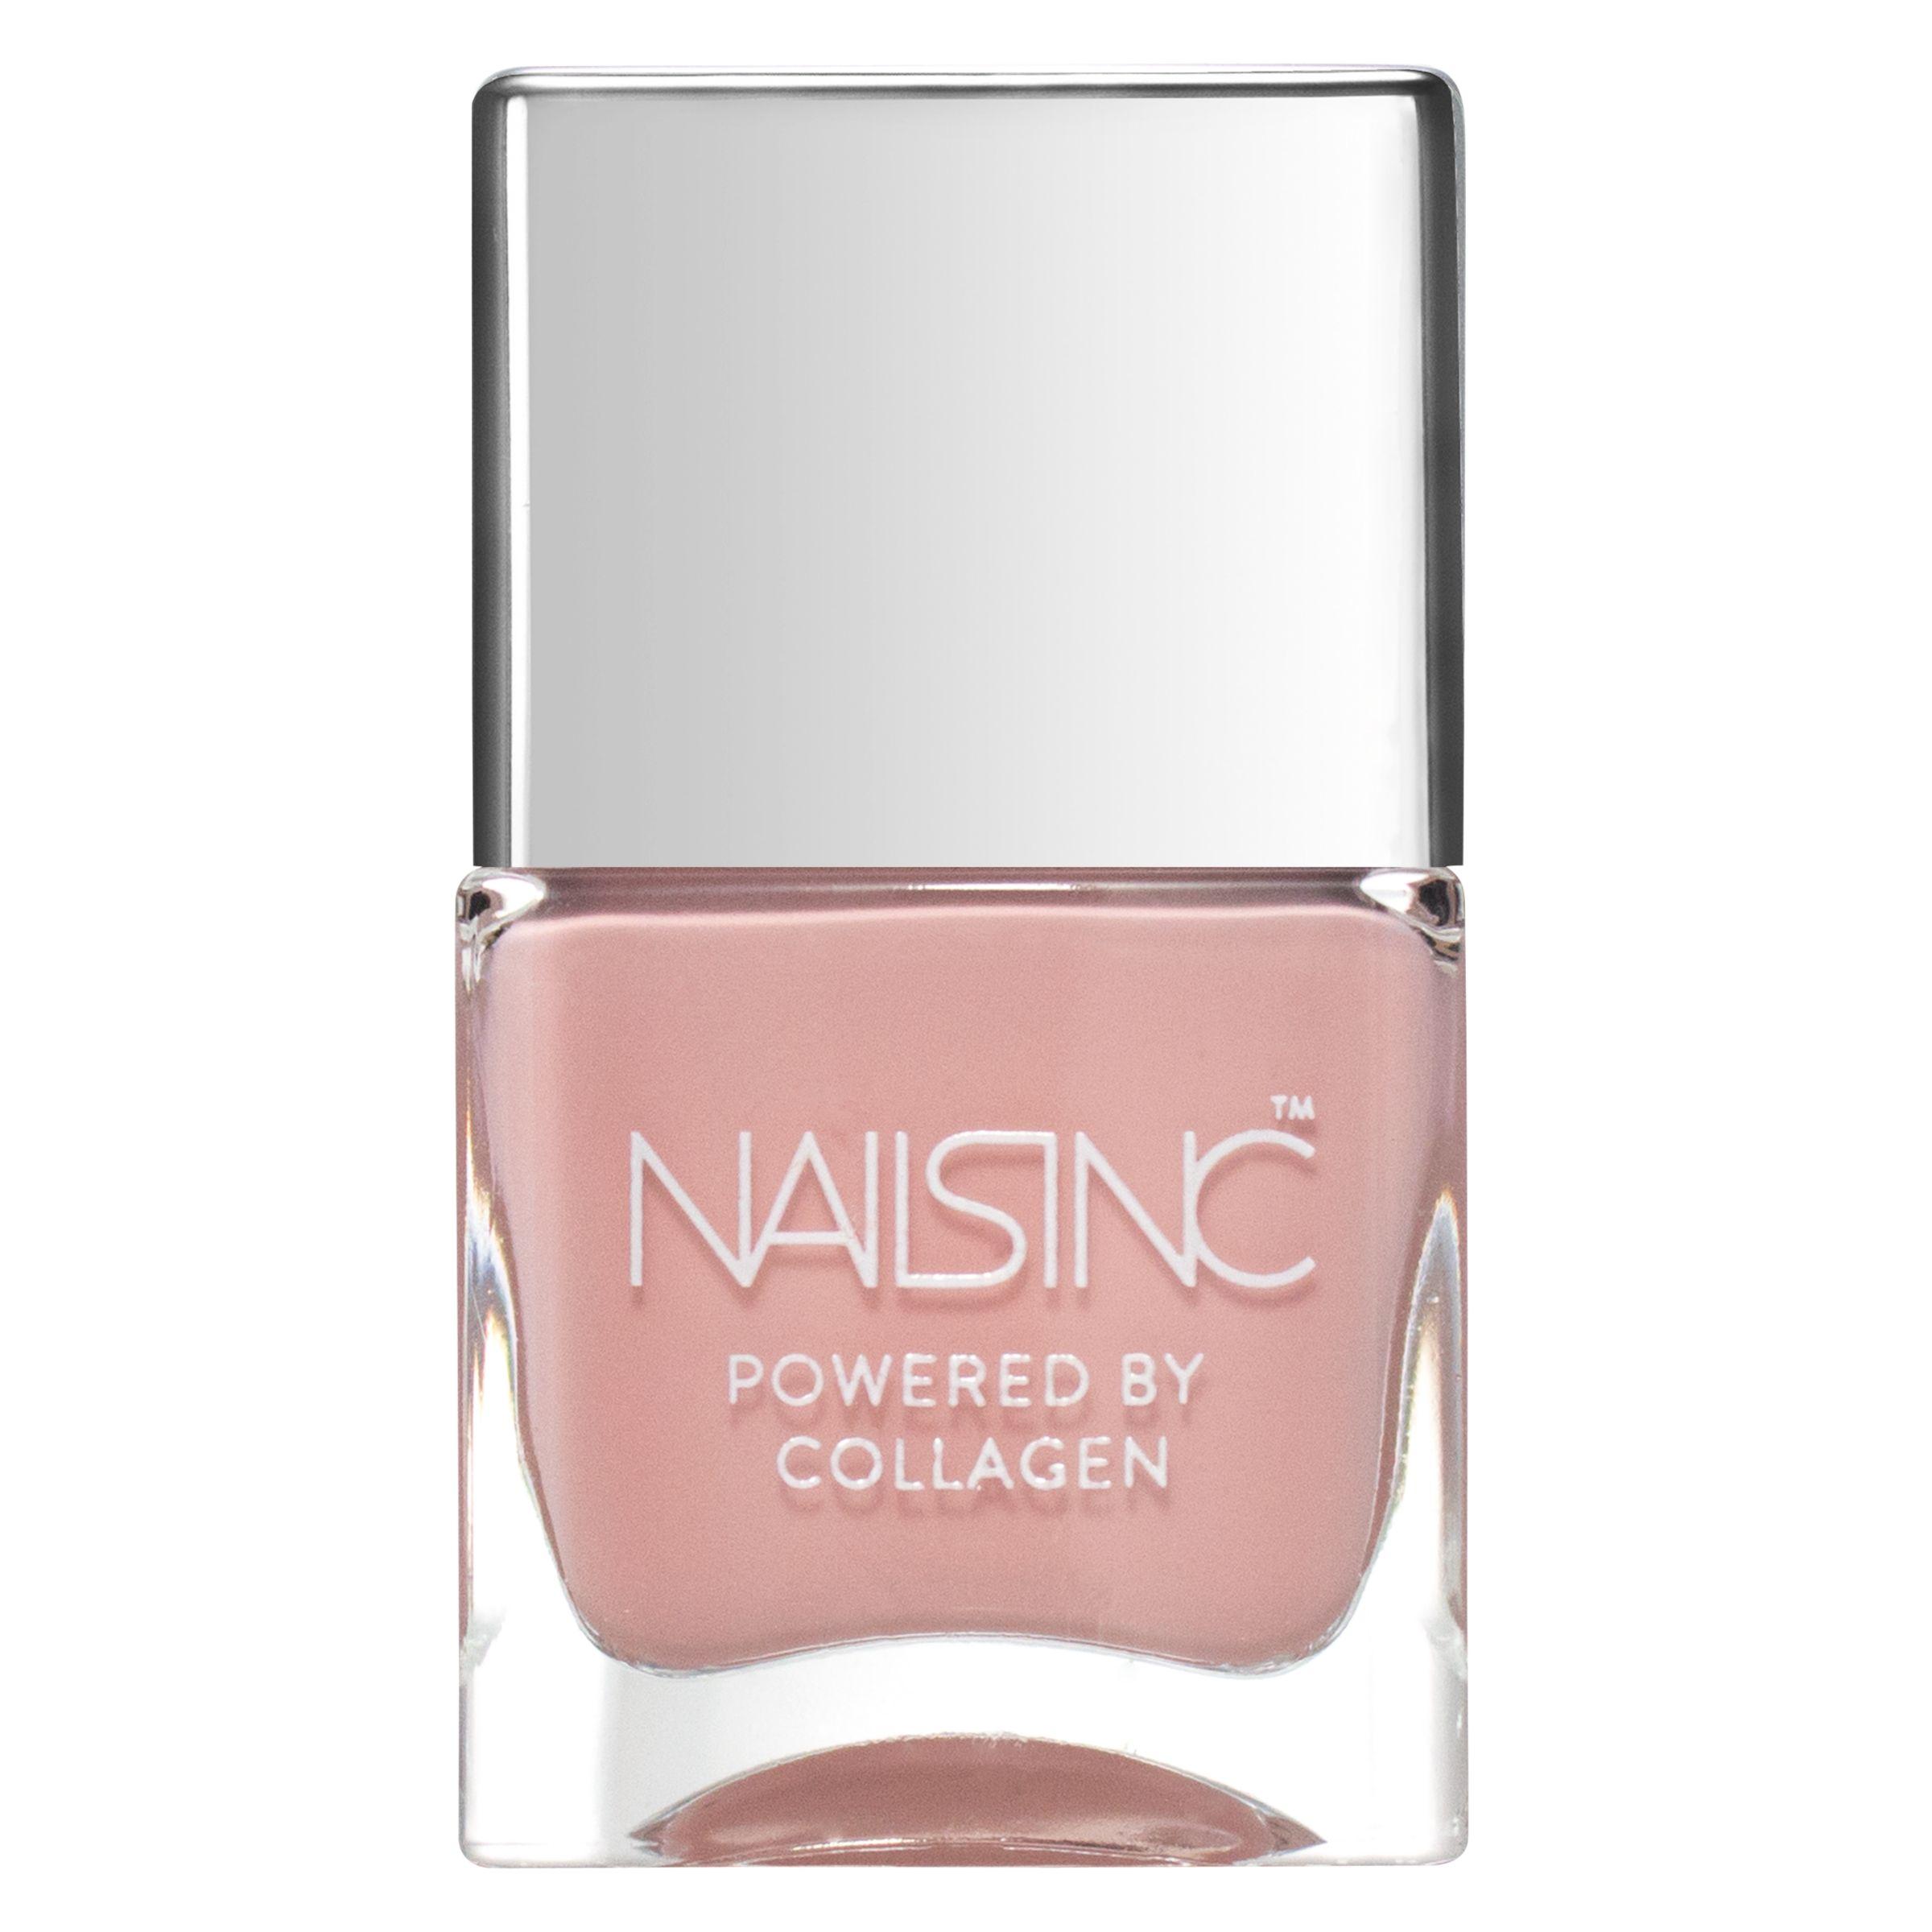 Nails Inc Nails Inc Powered By Collagen Nail Polish, 14ml